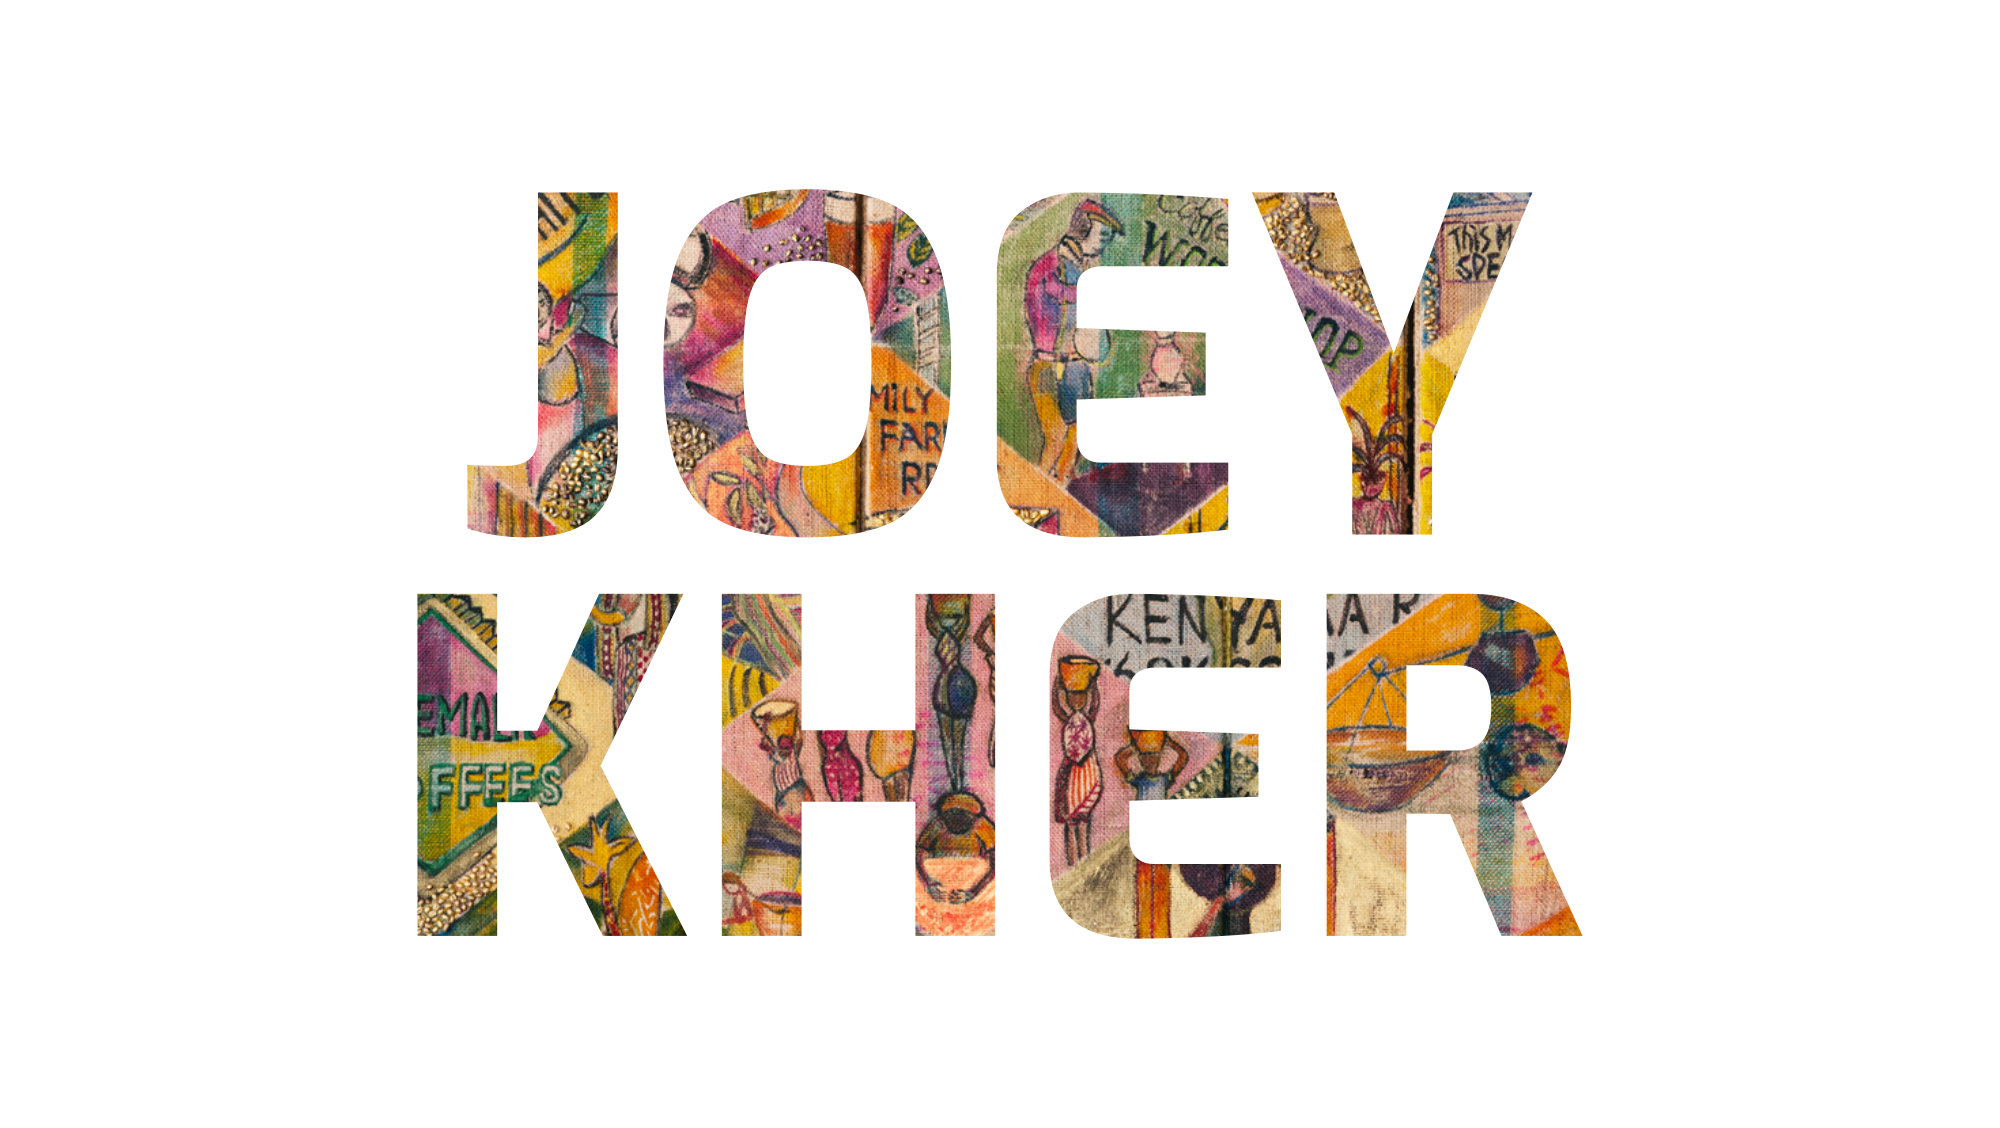 Artist Joey Kher Logo Mark Batik Art Batu Pahat Johor Malaysia A01